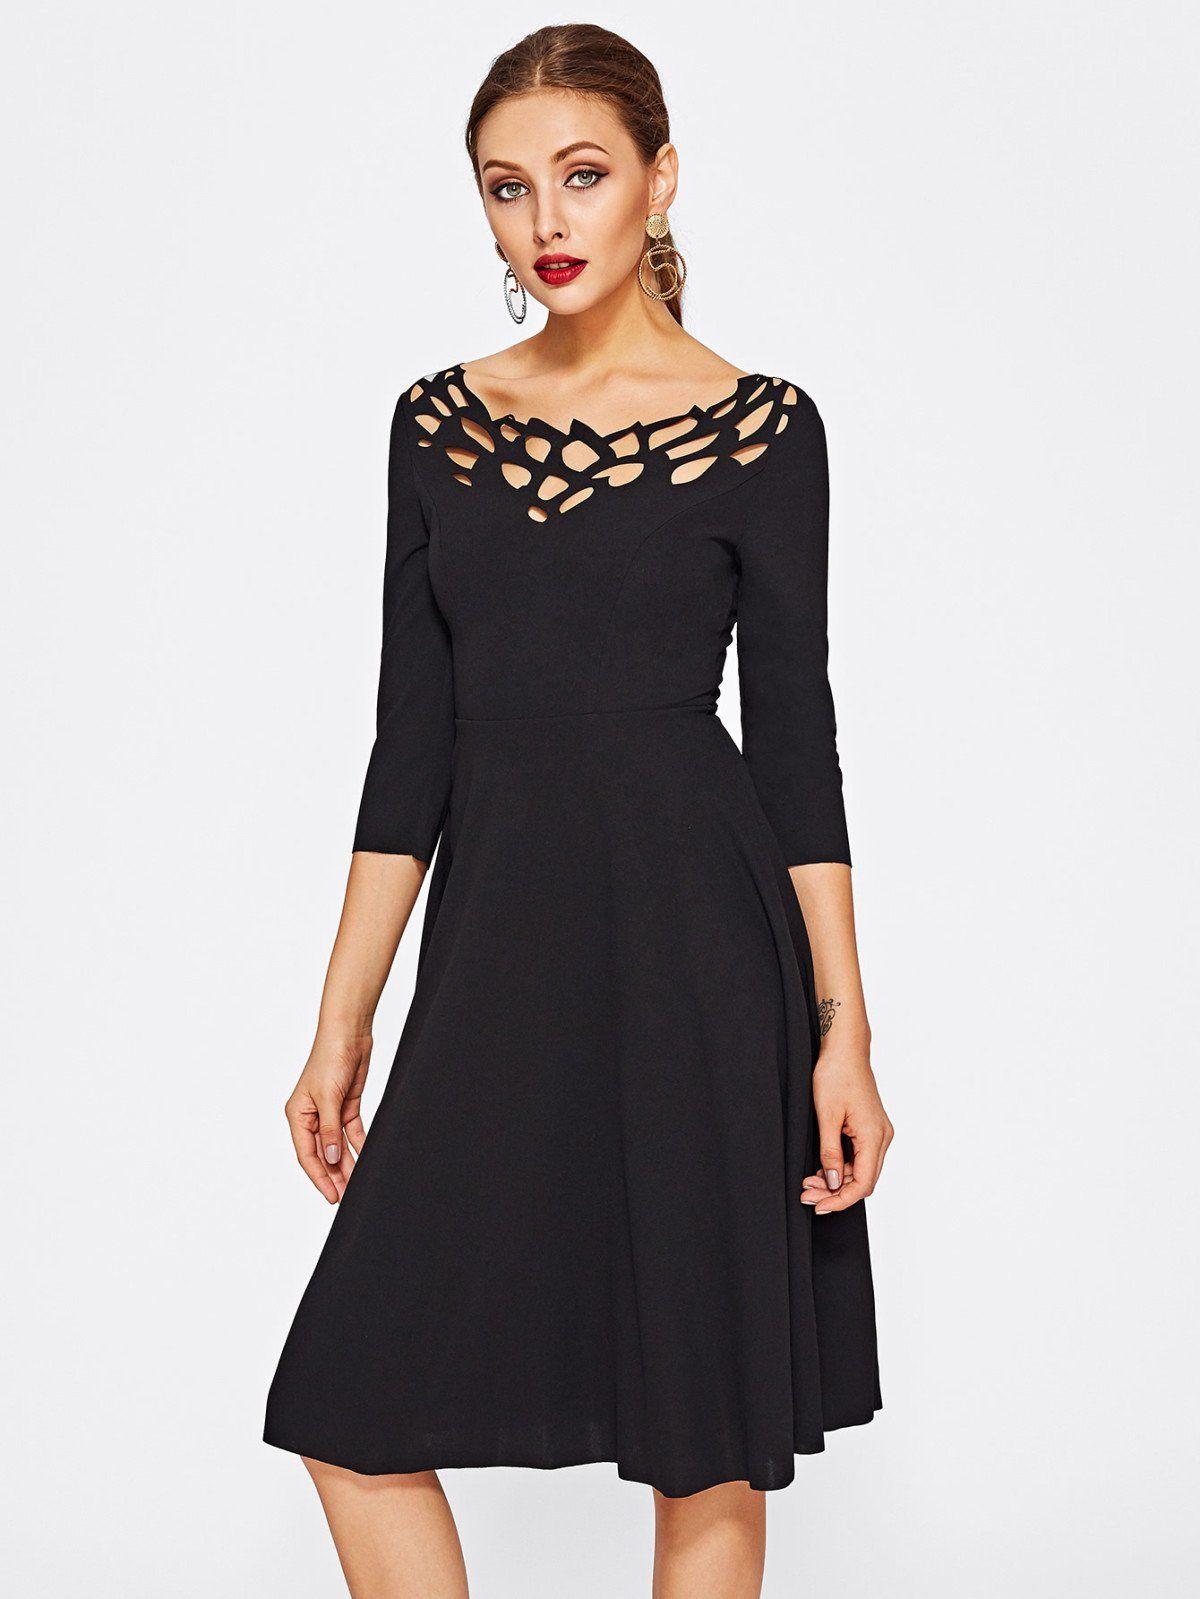 3013a80a1fb4 Laser Cut Neck Fit   Flare Dress